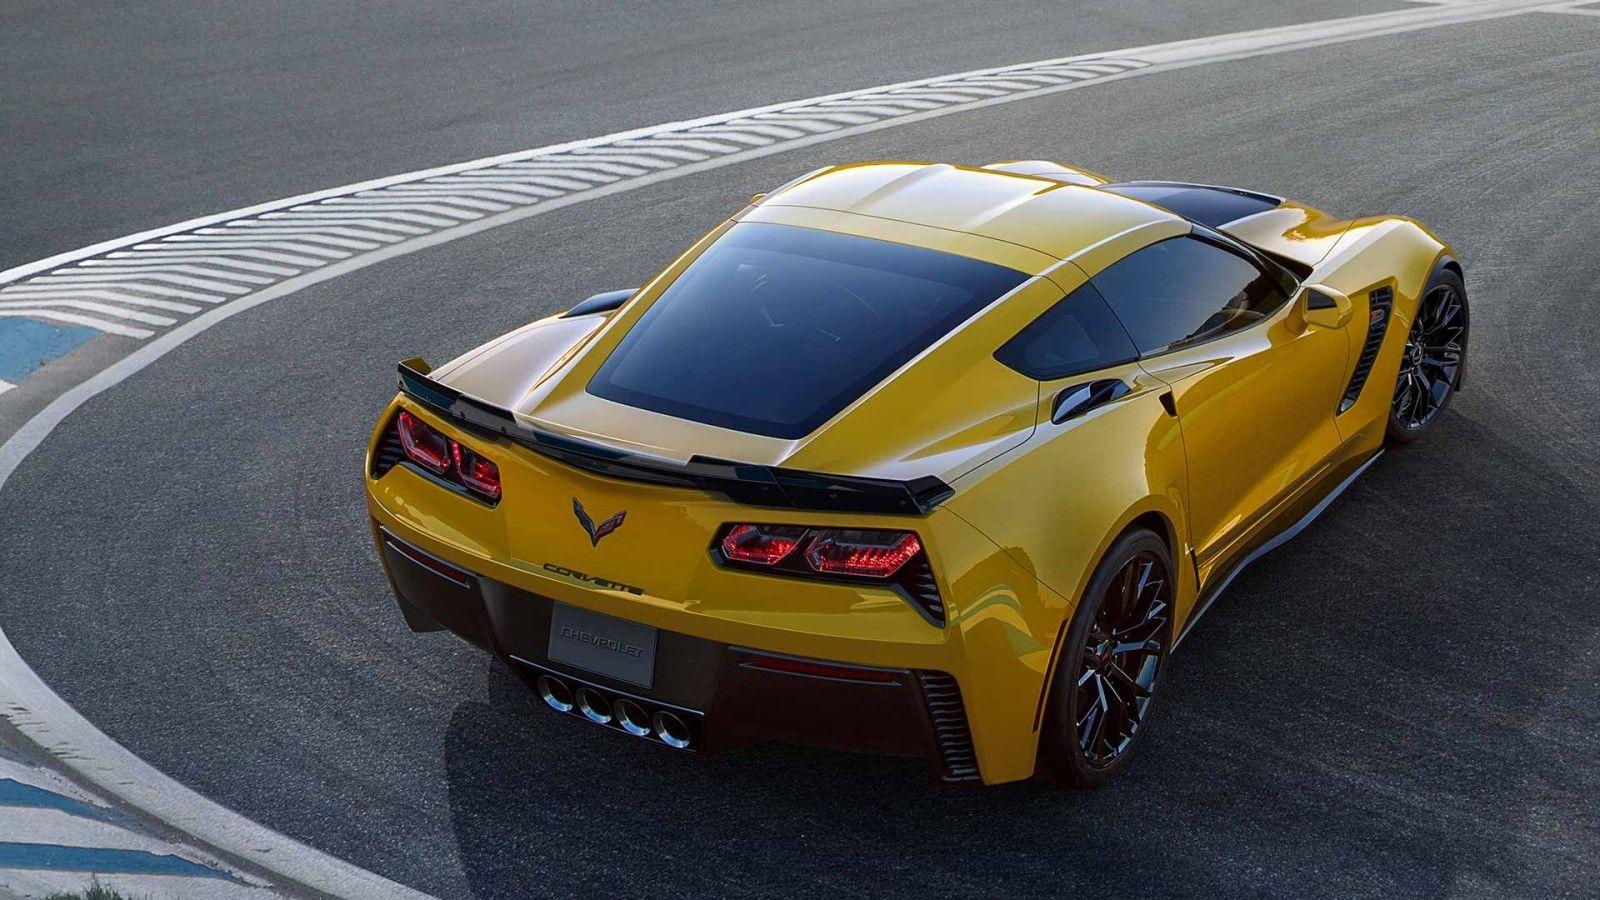 2015 Corvette Z06 Picture Gallery Chevrolet Chevrolet